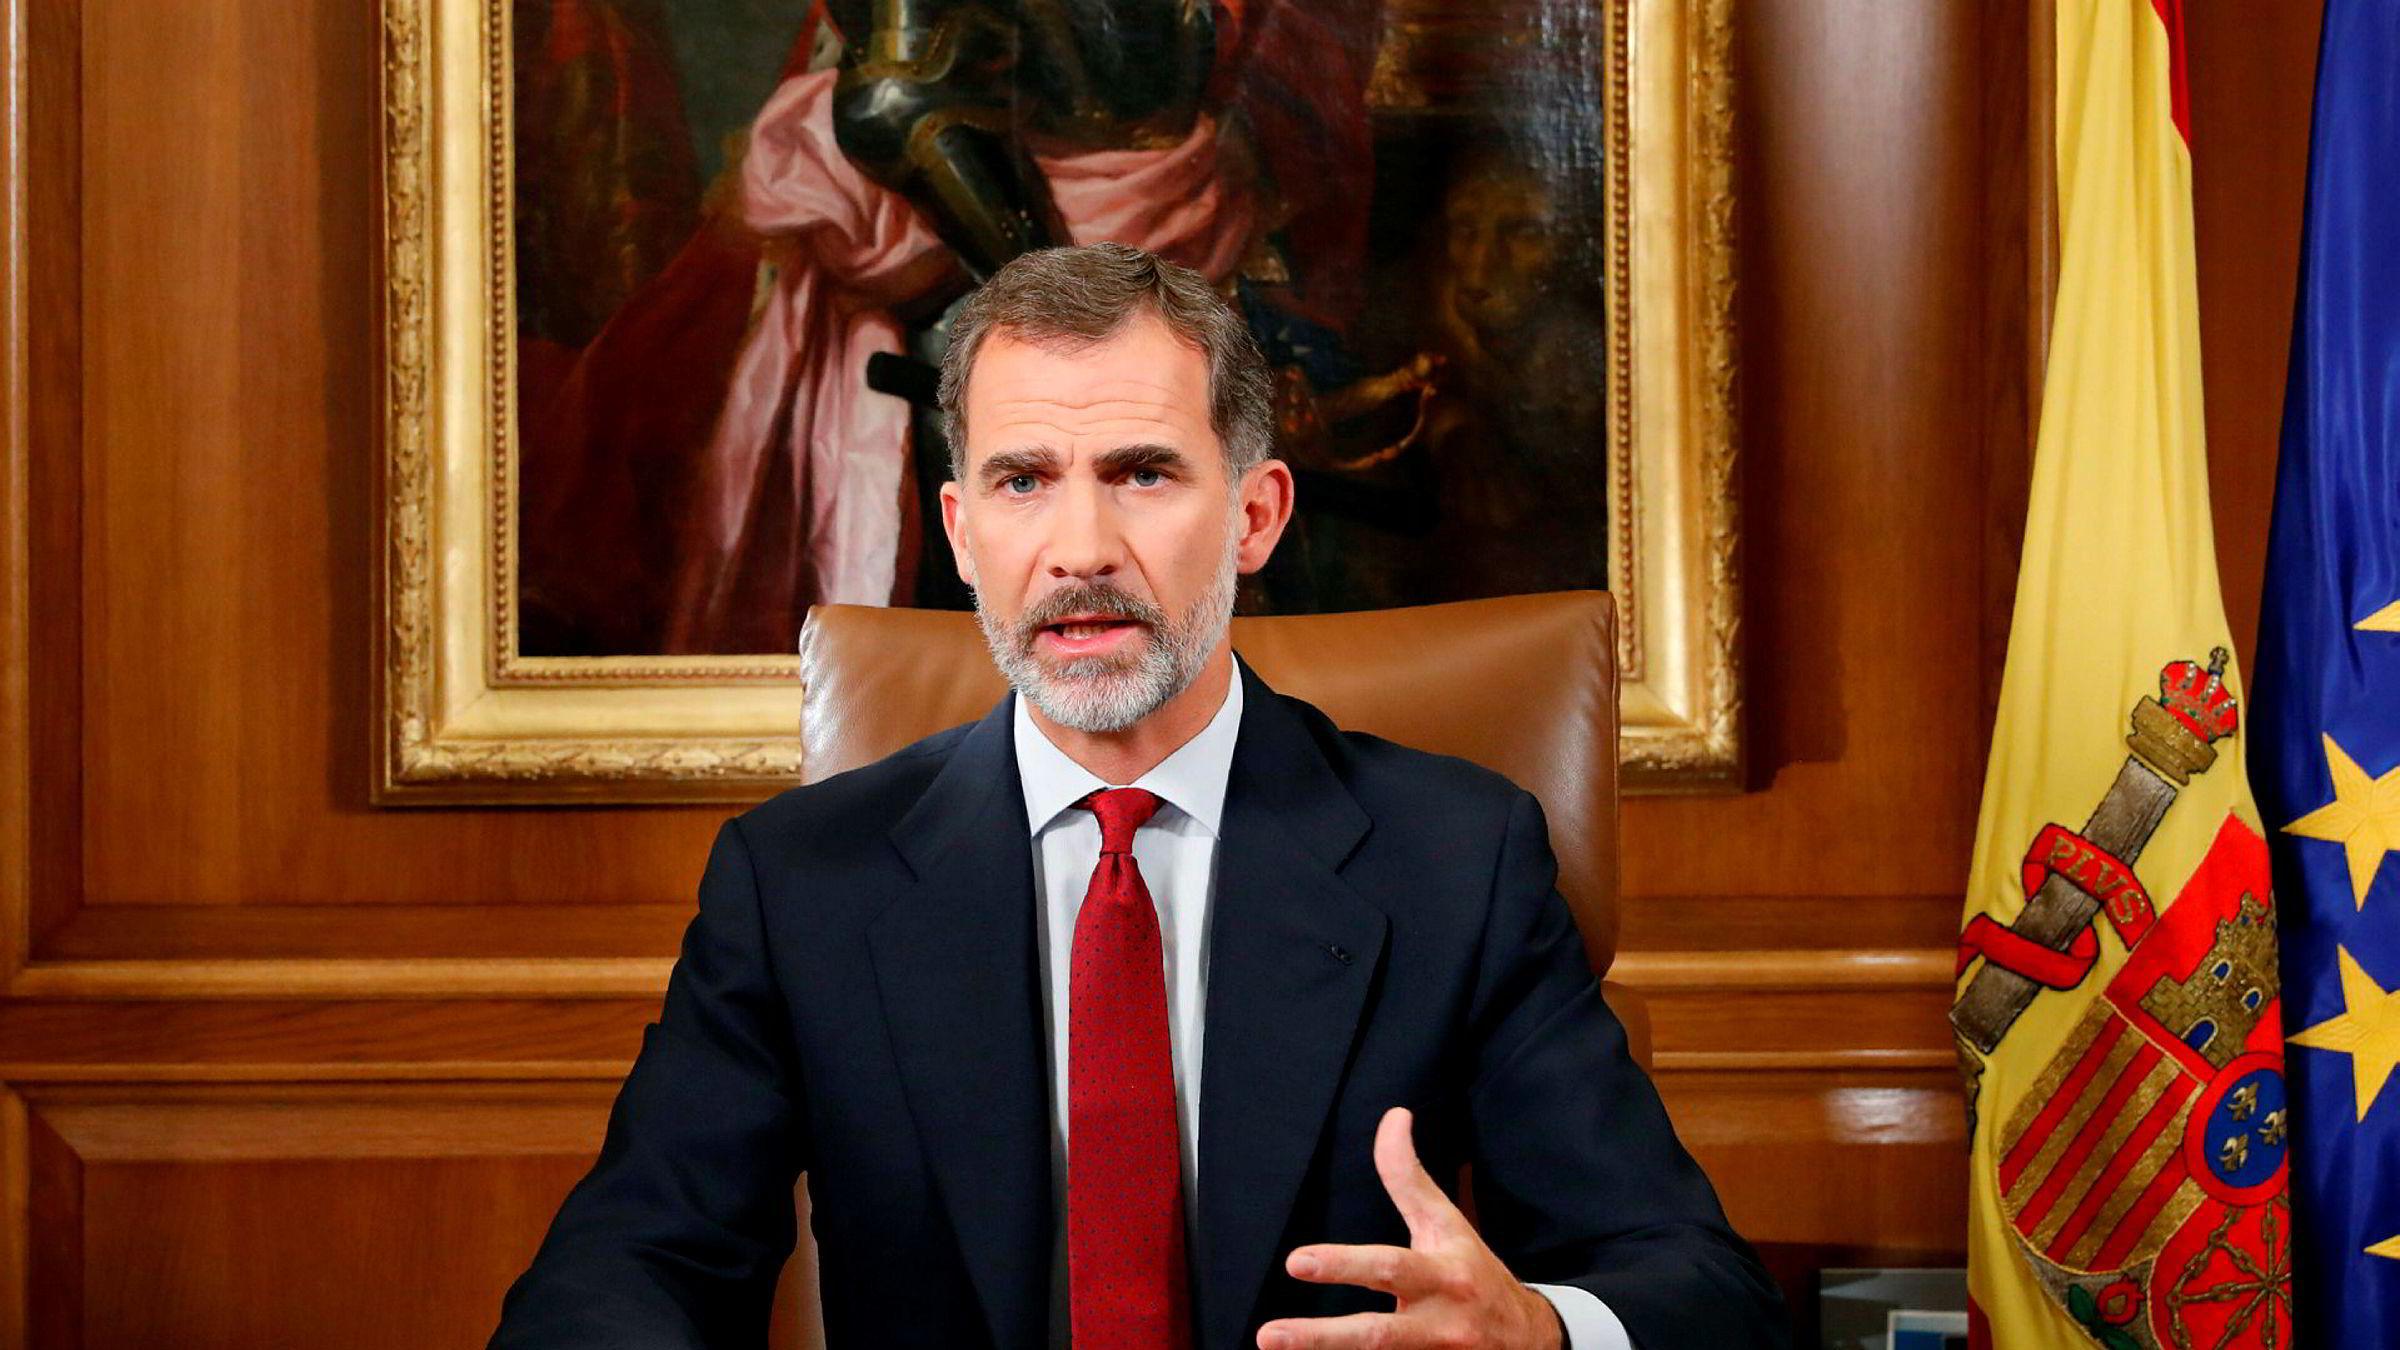 Kong Felipe i en tv-sendt tale i kveld.